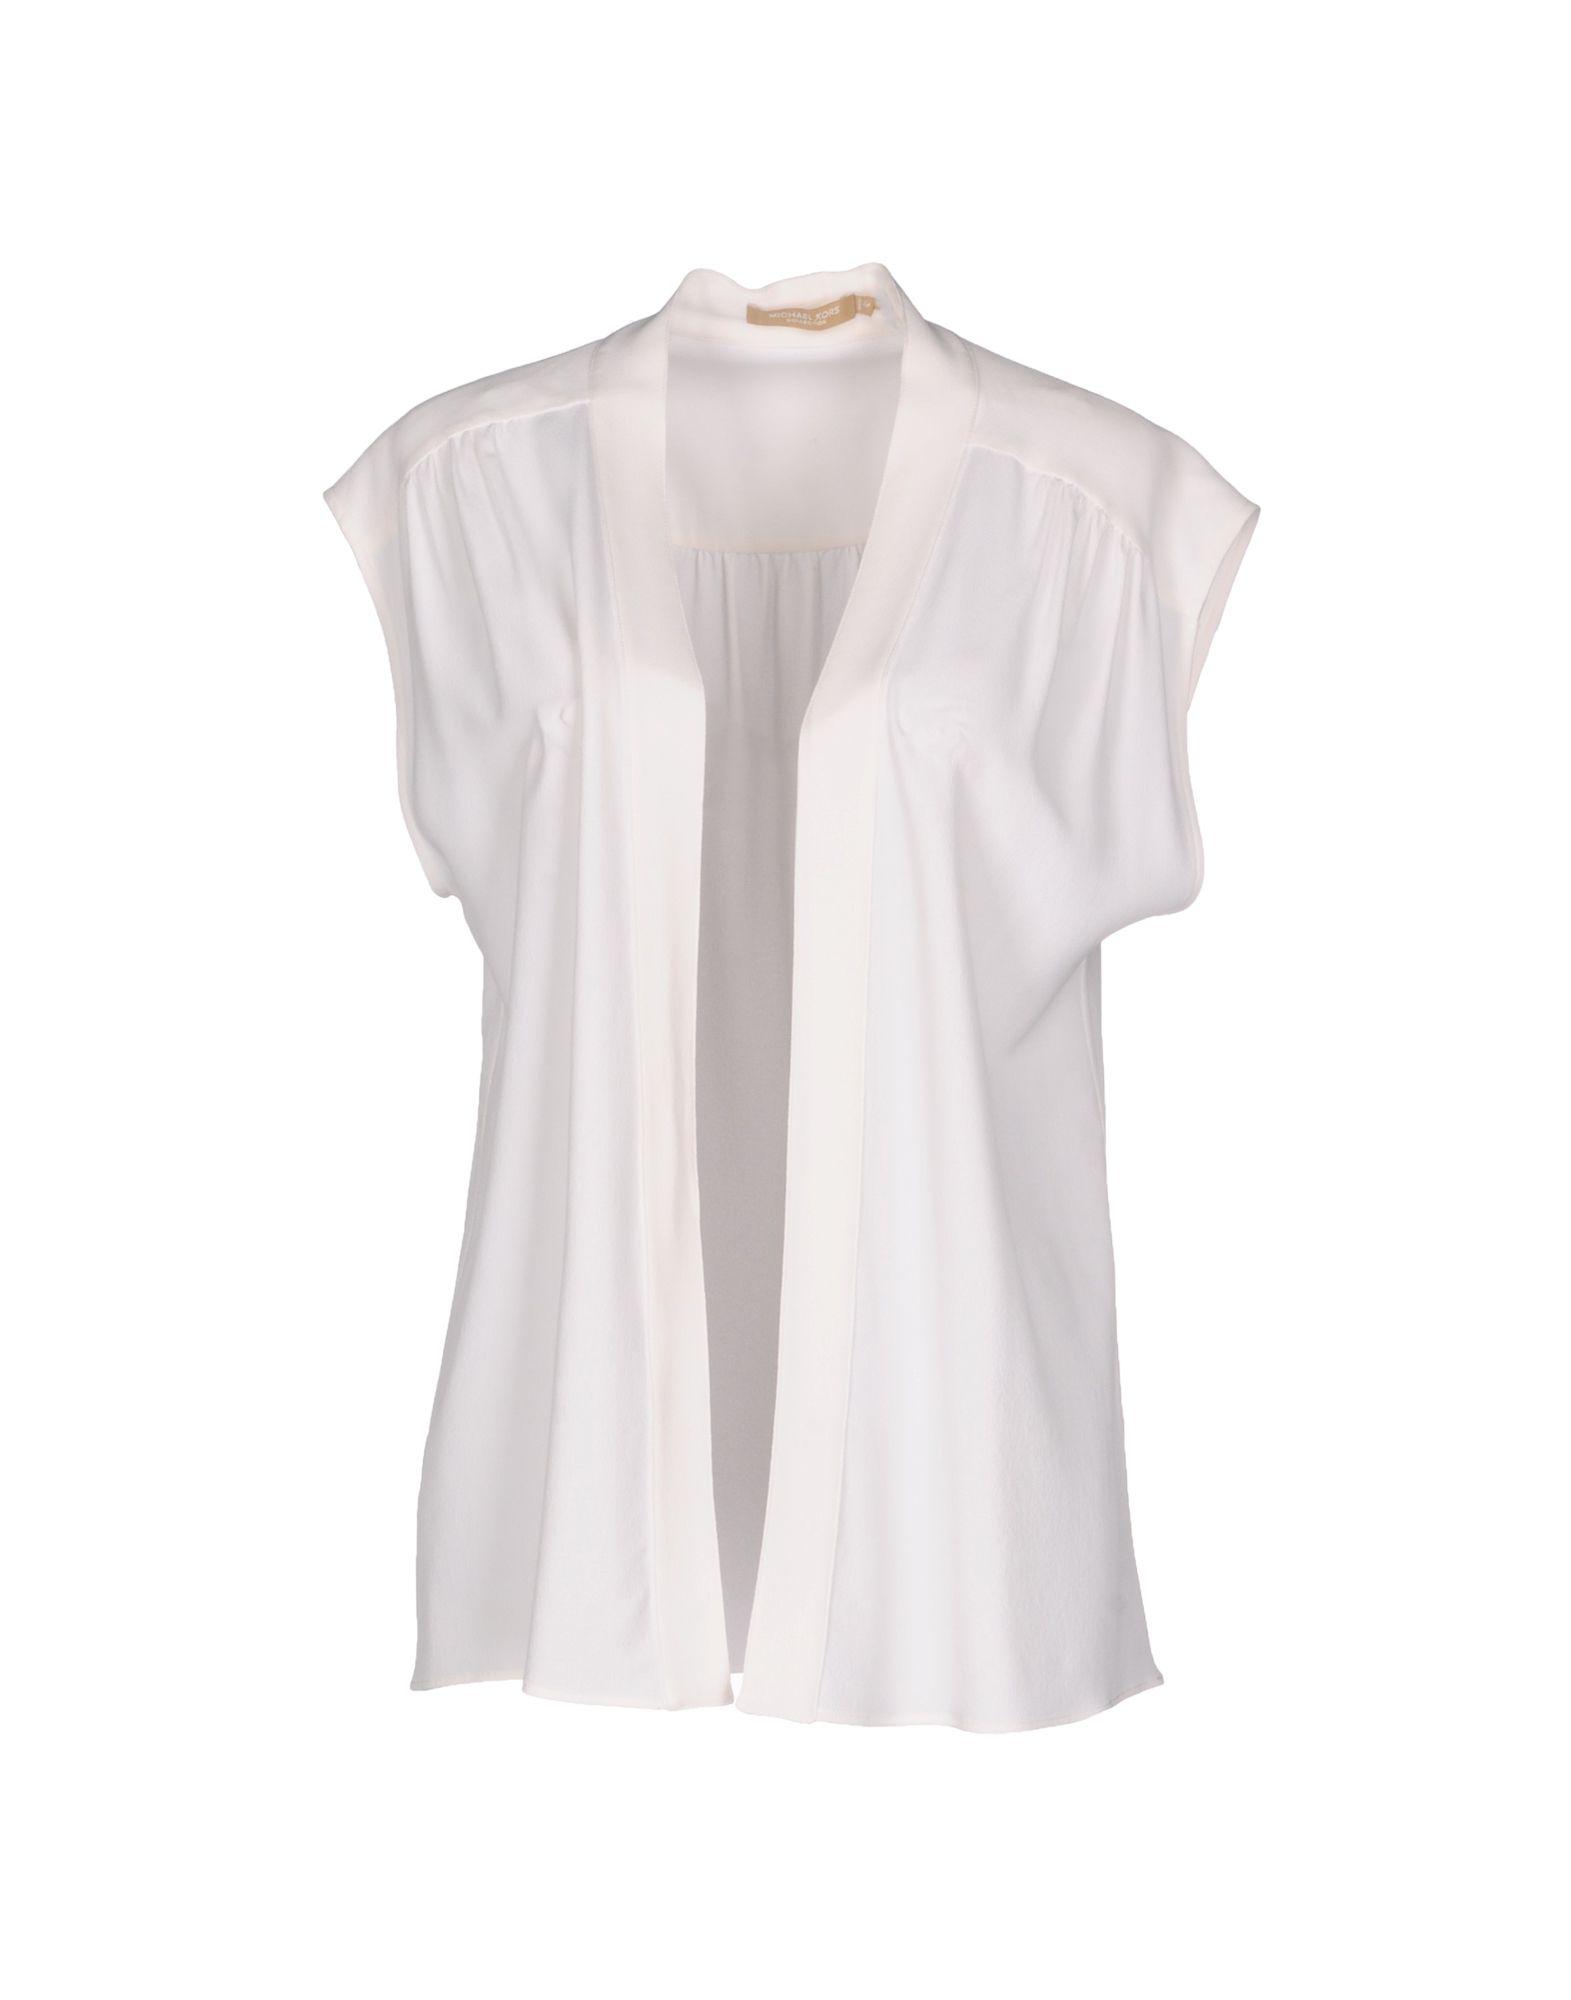 Фото - MICHAEL KORS COLLECTION Кардиган michael kors collection юбка длиной 3 4